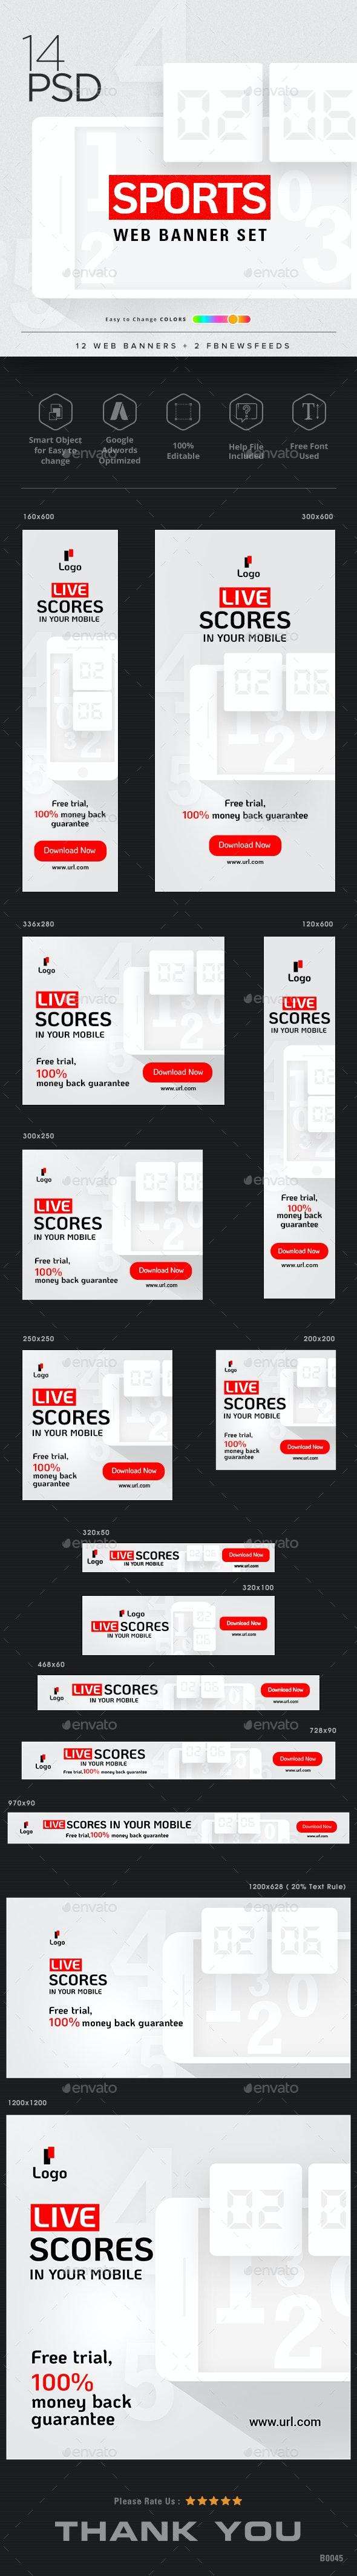 Sports Web Banner Set - Banners & Ads Web Elements